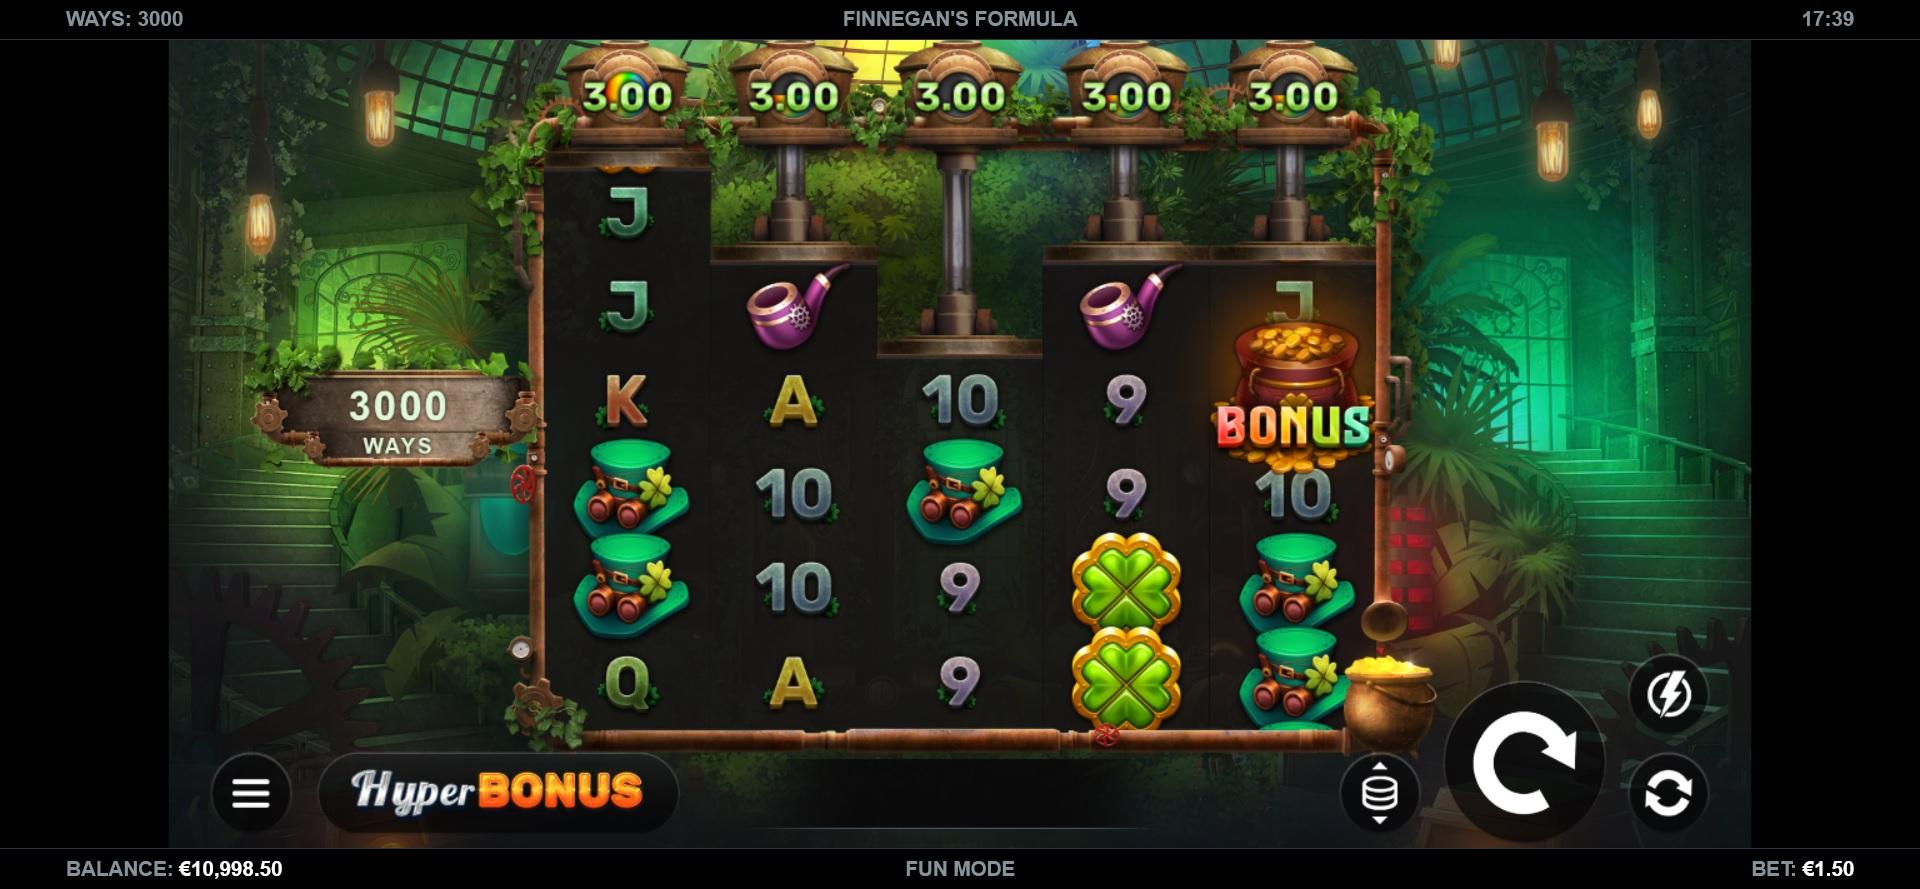 Finnegan's Formula by Kalamba Games Reels during main game